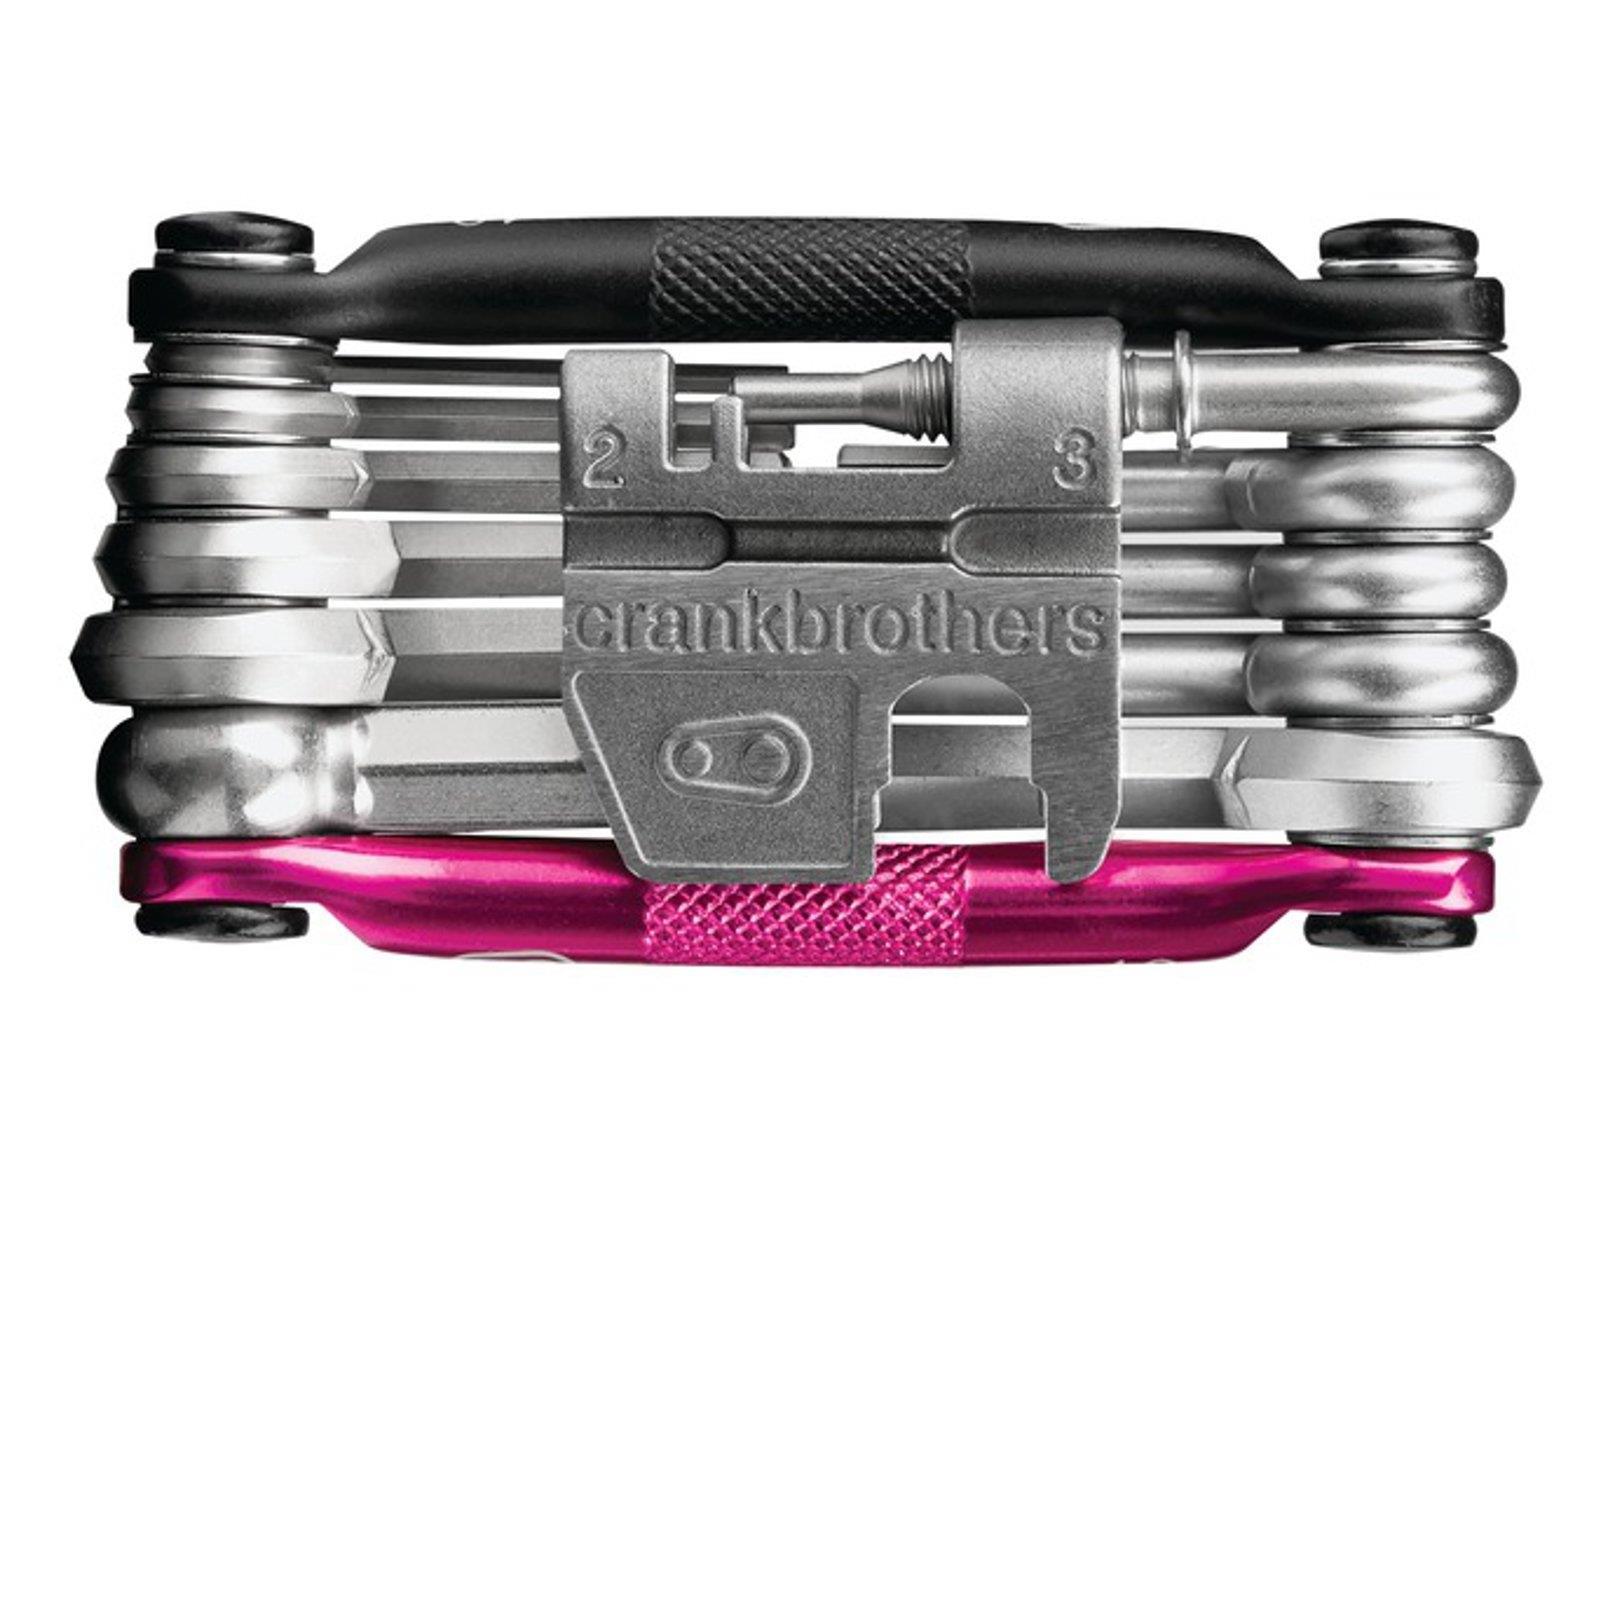 Crankbrothers-herramienta-multifuncional-17-pzas-multi-herramienta-bicicleta-herramienta-multi miniatura 7